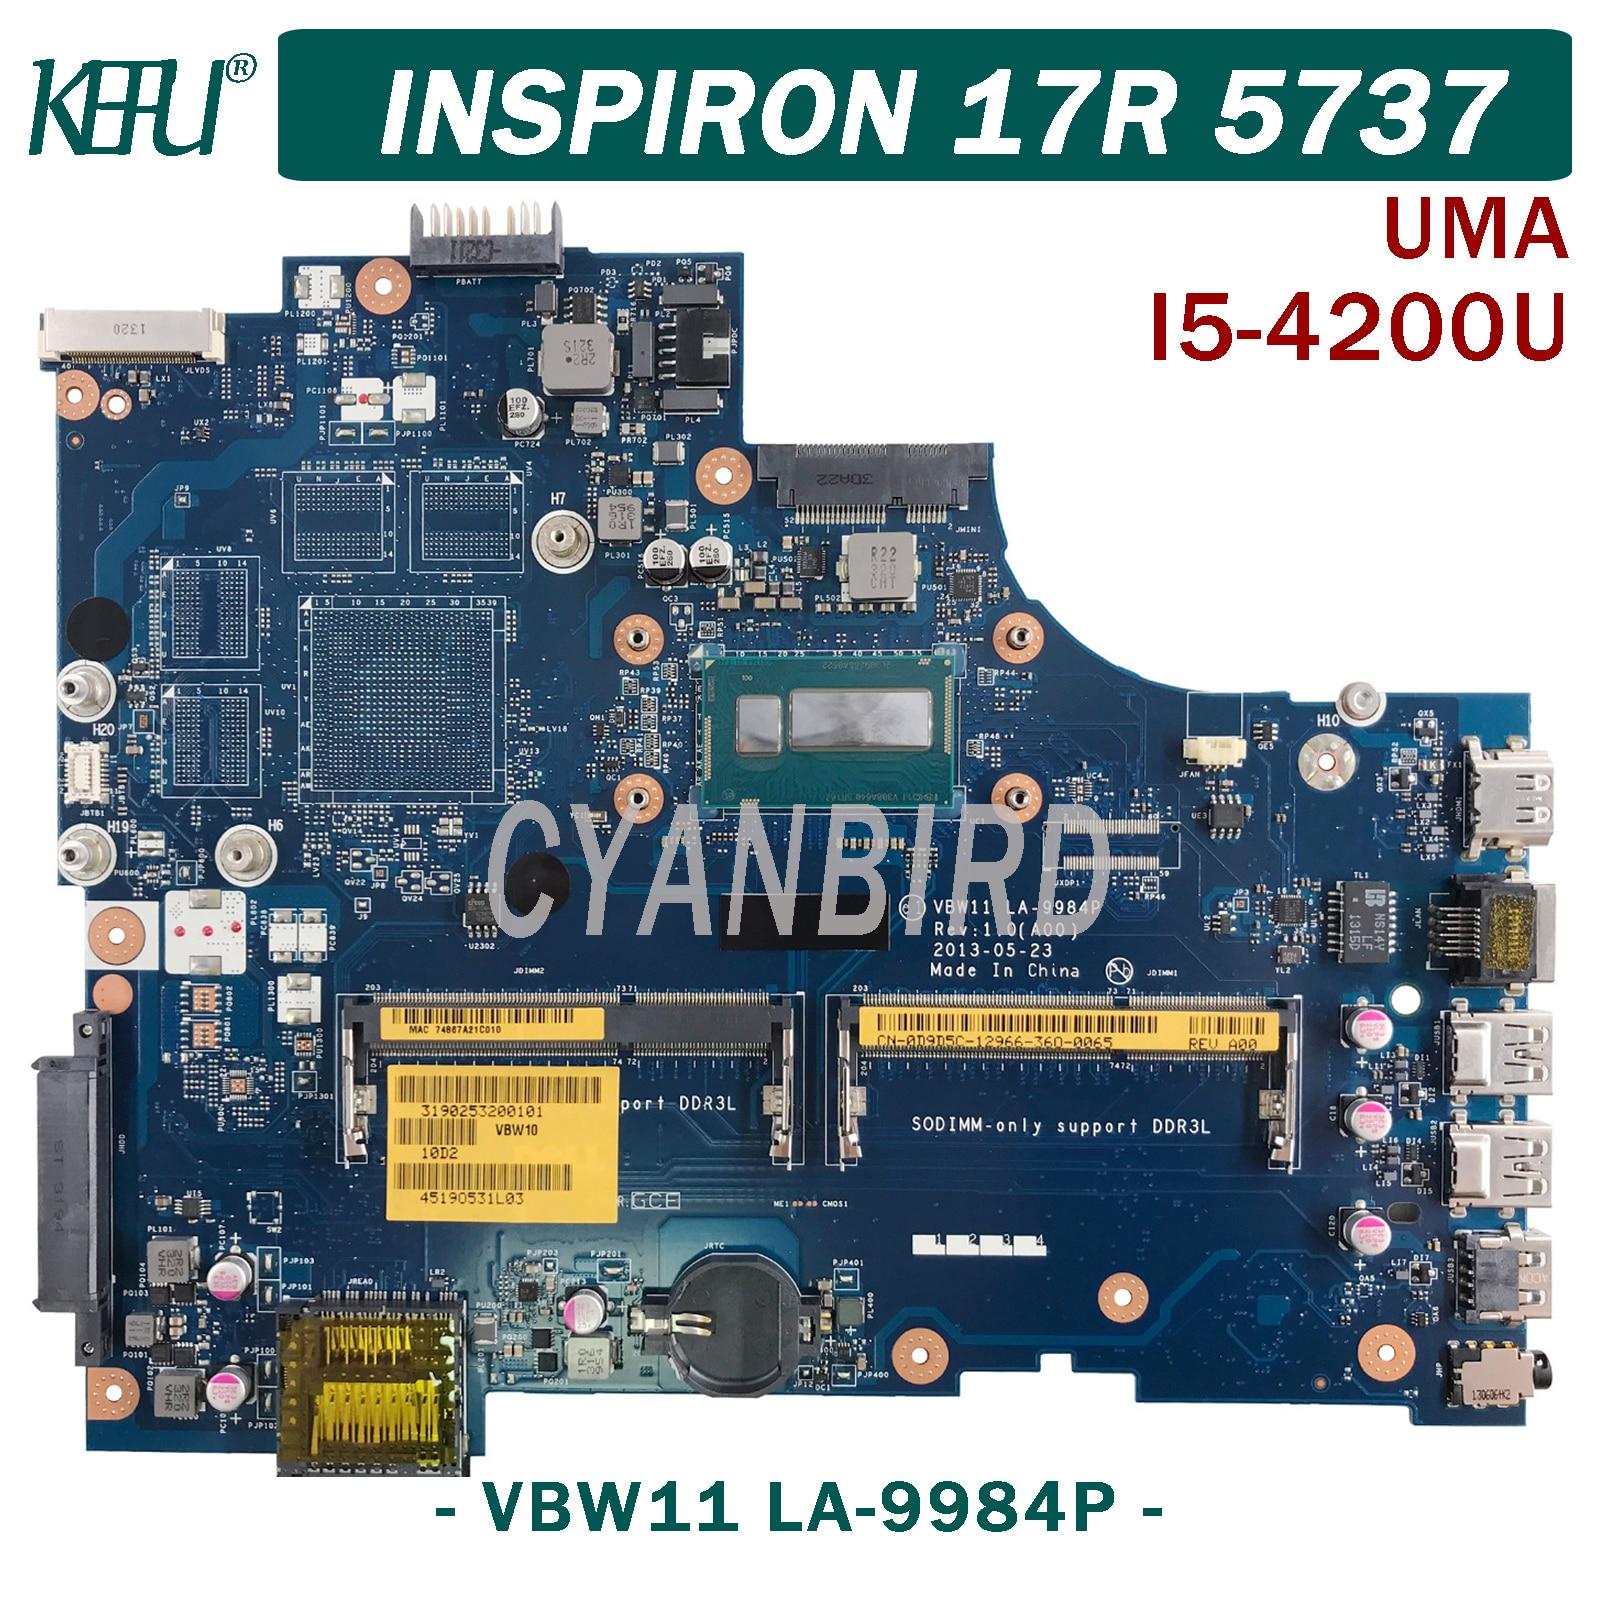 KEFU VBW11 LA-9984P اللوحة الرئيسية الأصلية لديل 17R 3737 5737 UMA مع I5-4200U اللوحة الأم للكمبيوتر المحمول